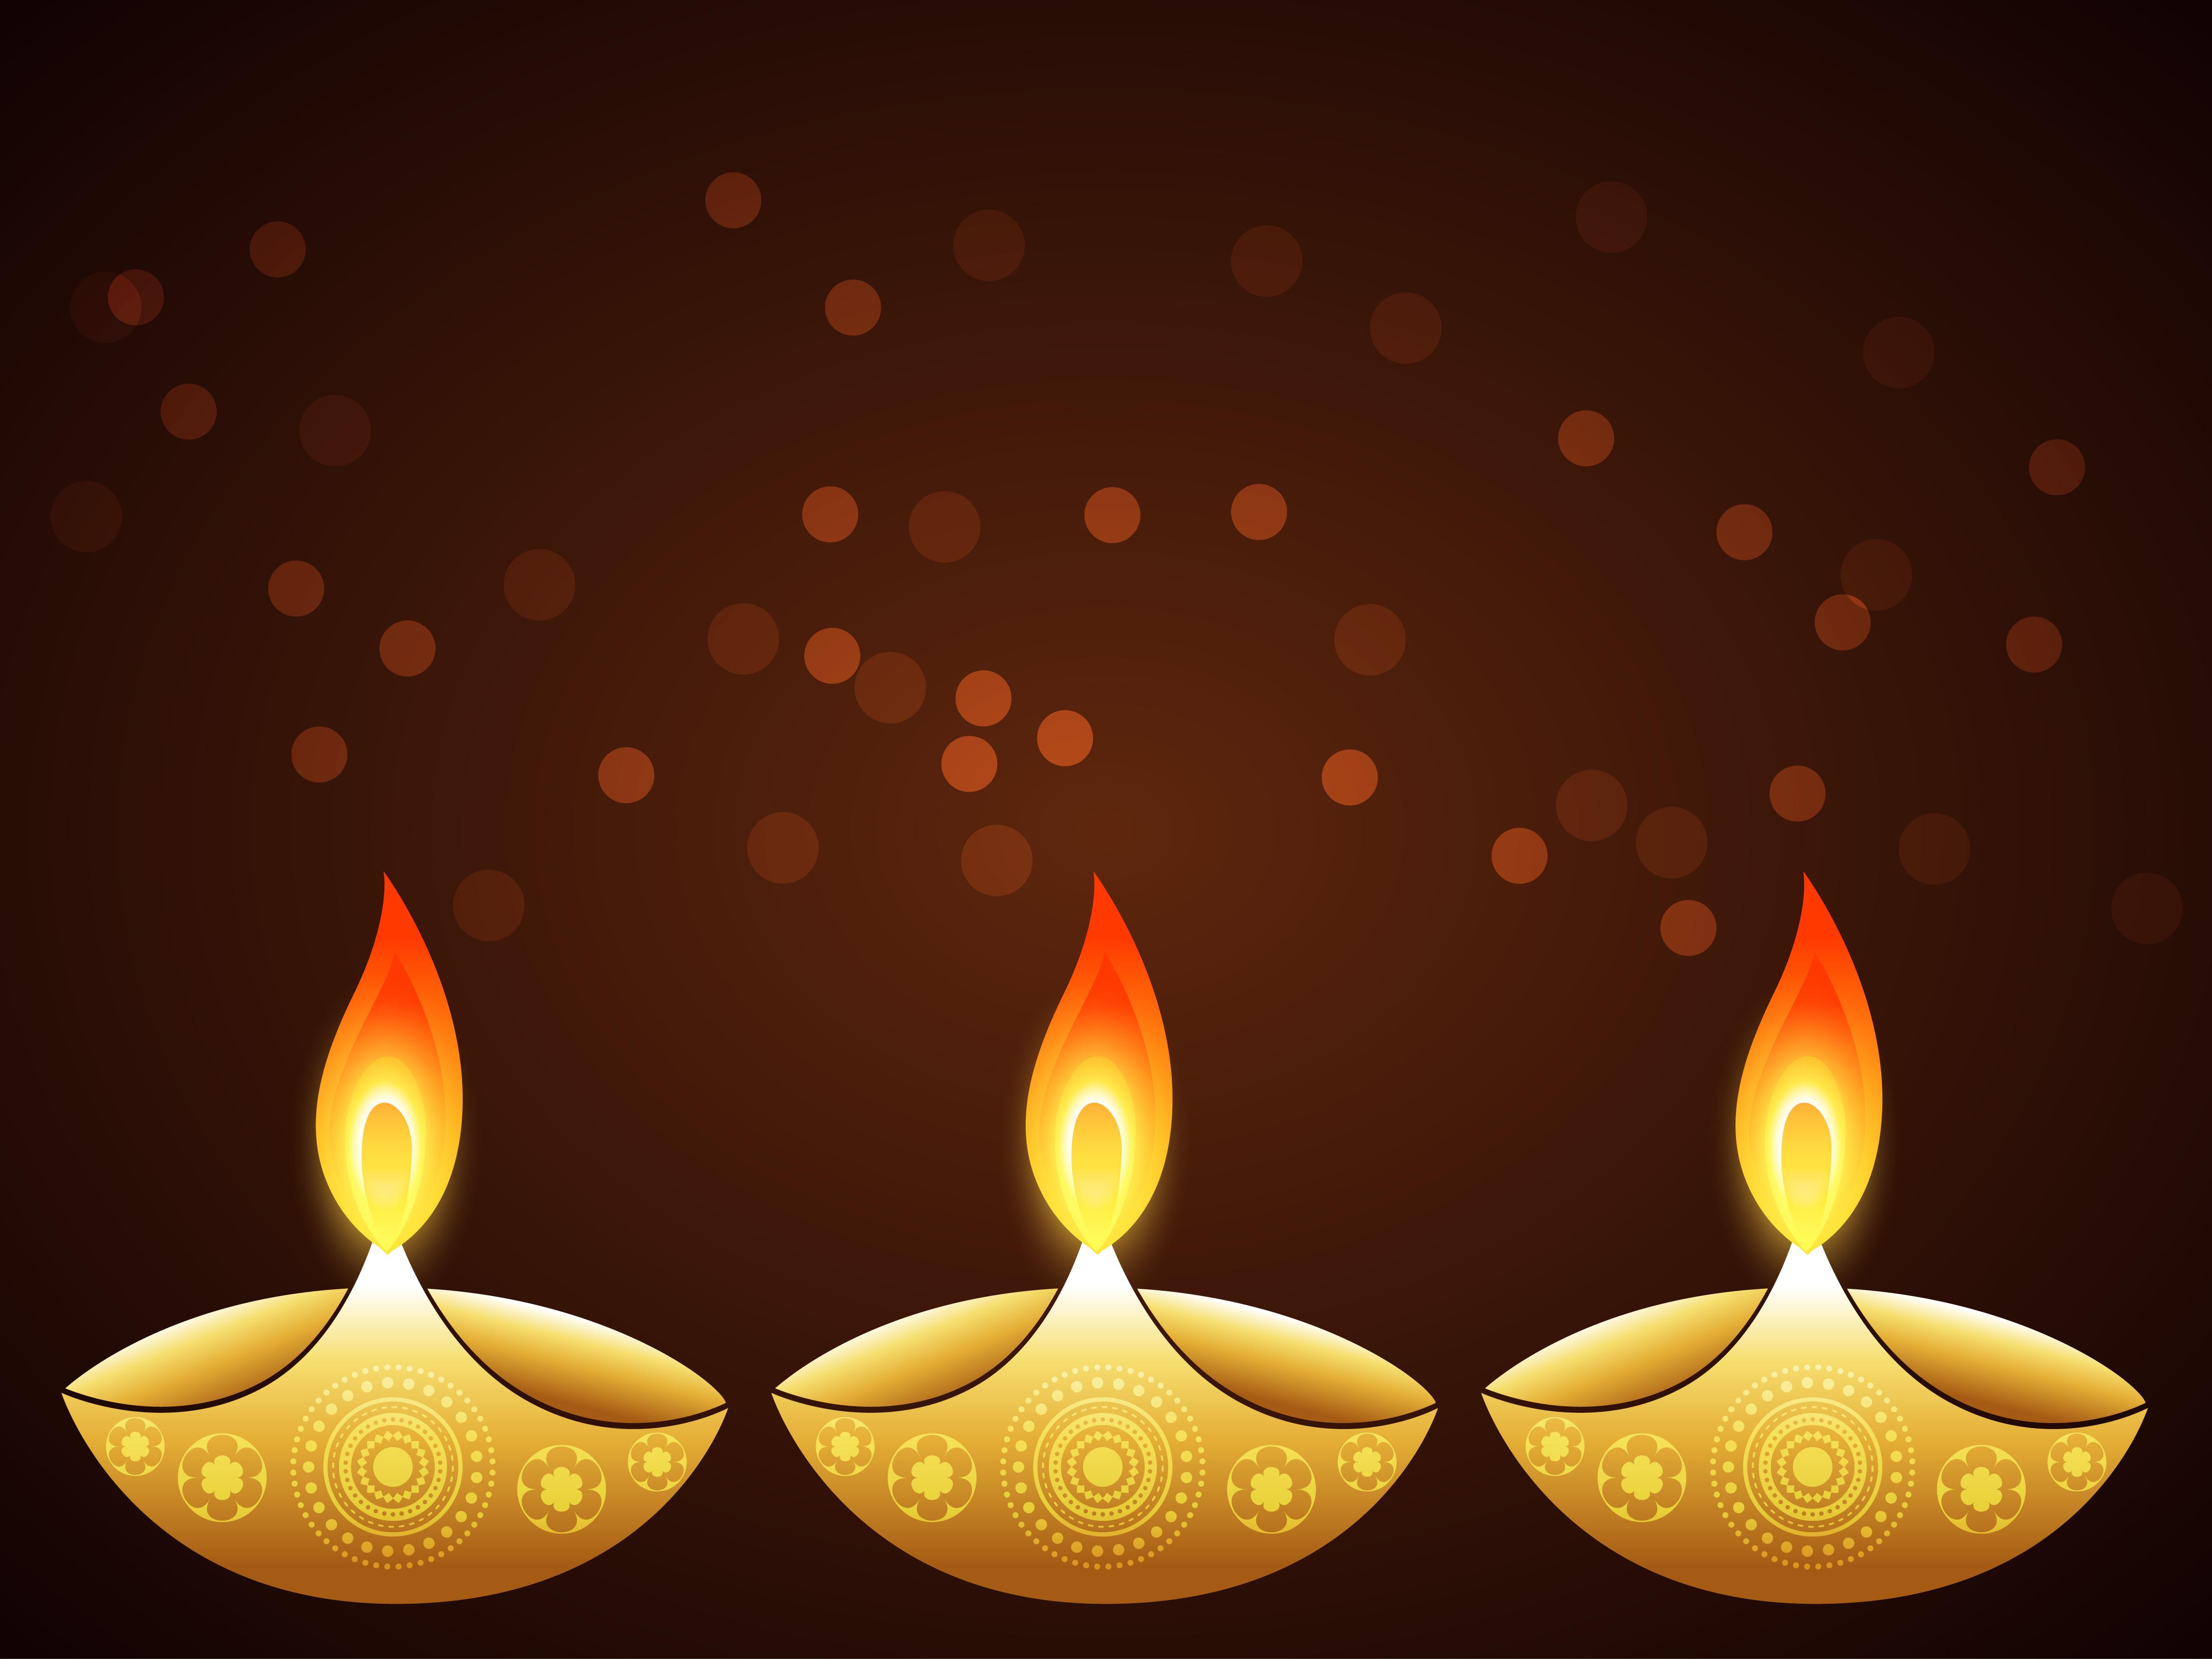 Stylish Diwali Greeting Download Free Vector Art Stock Graphics